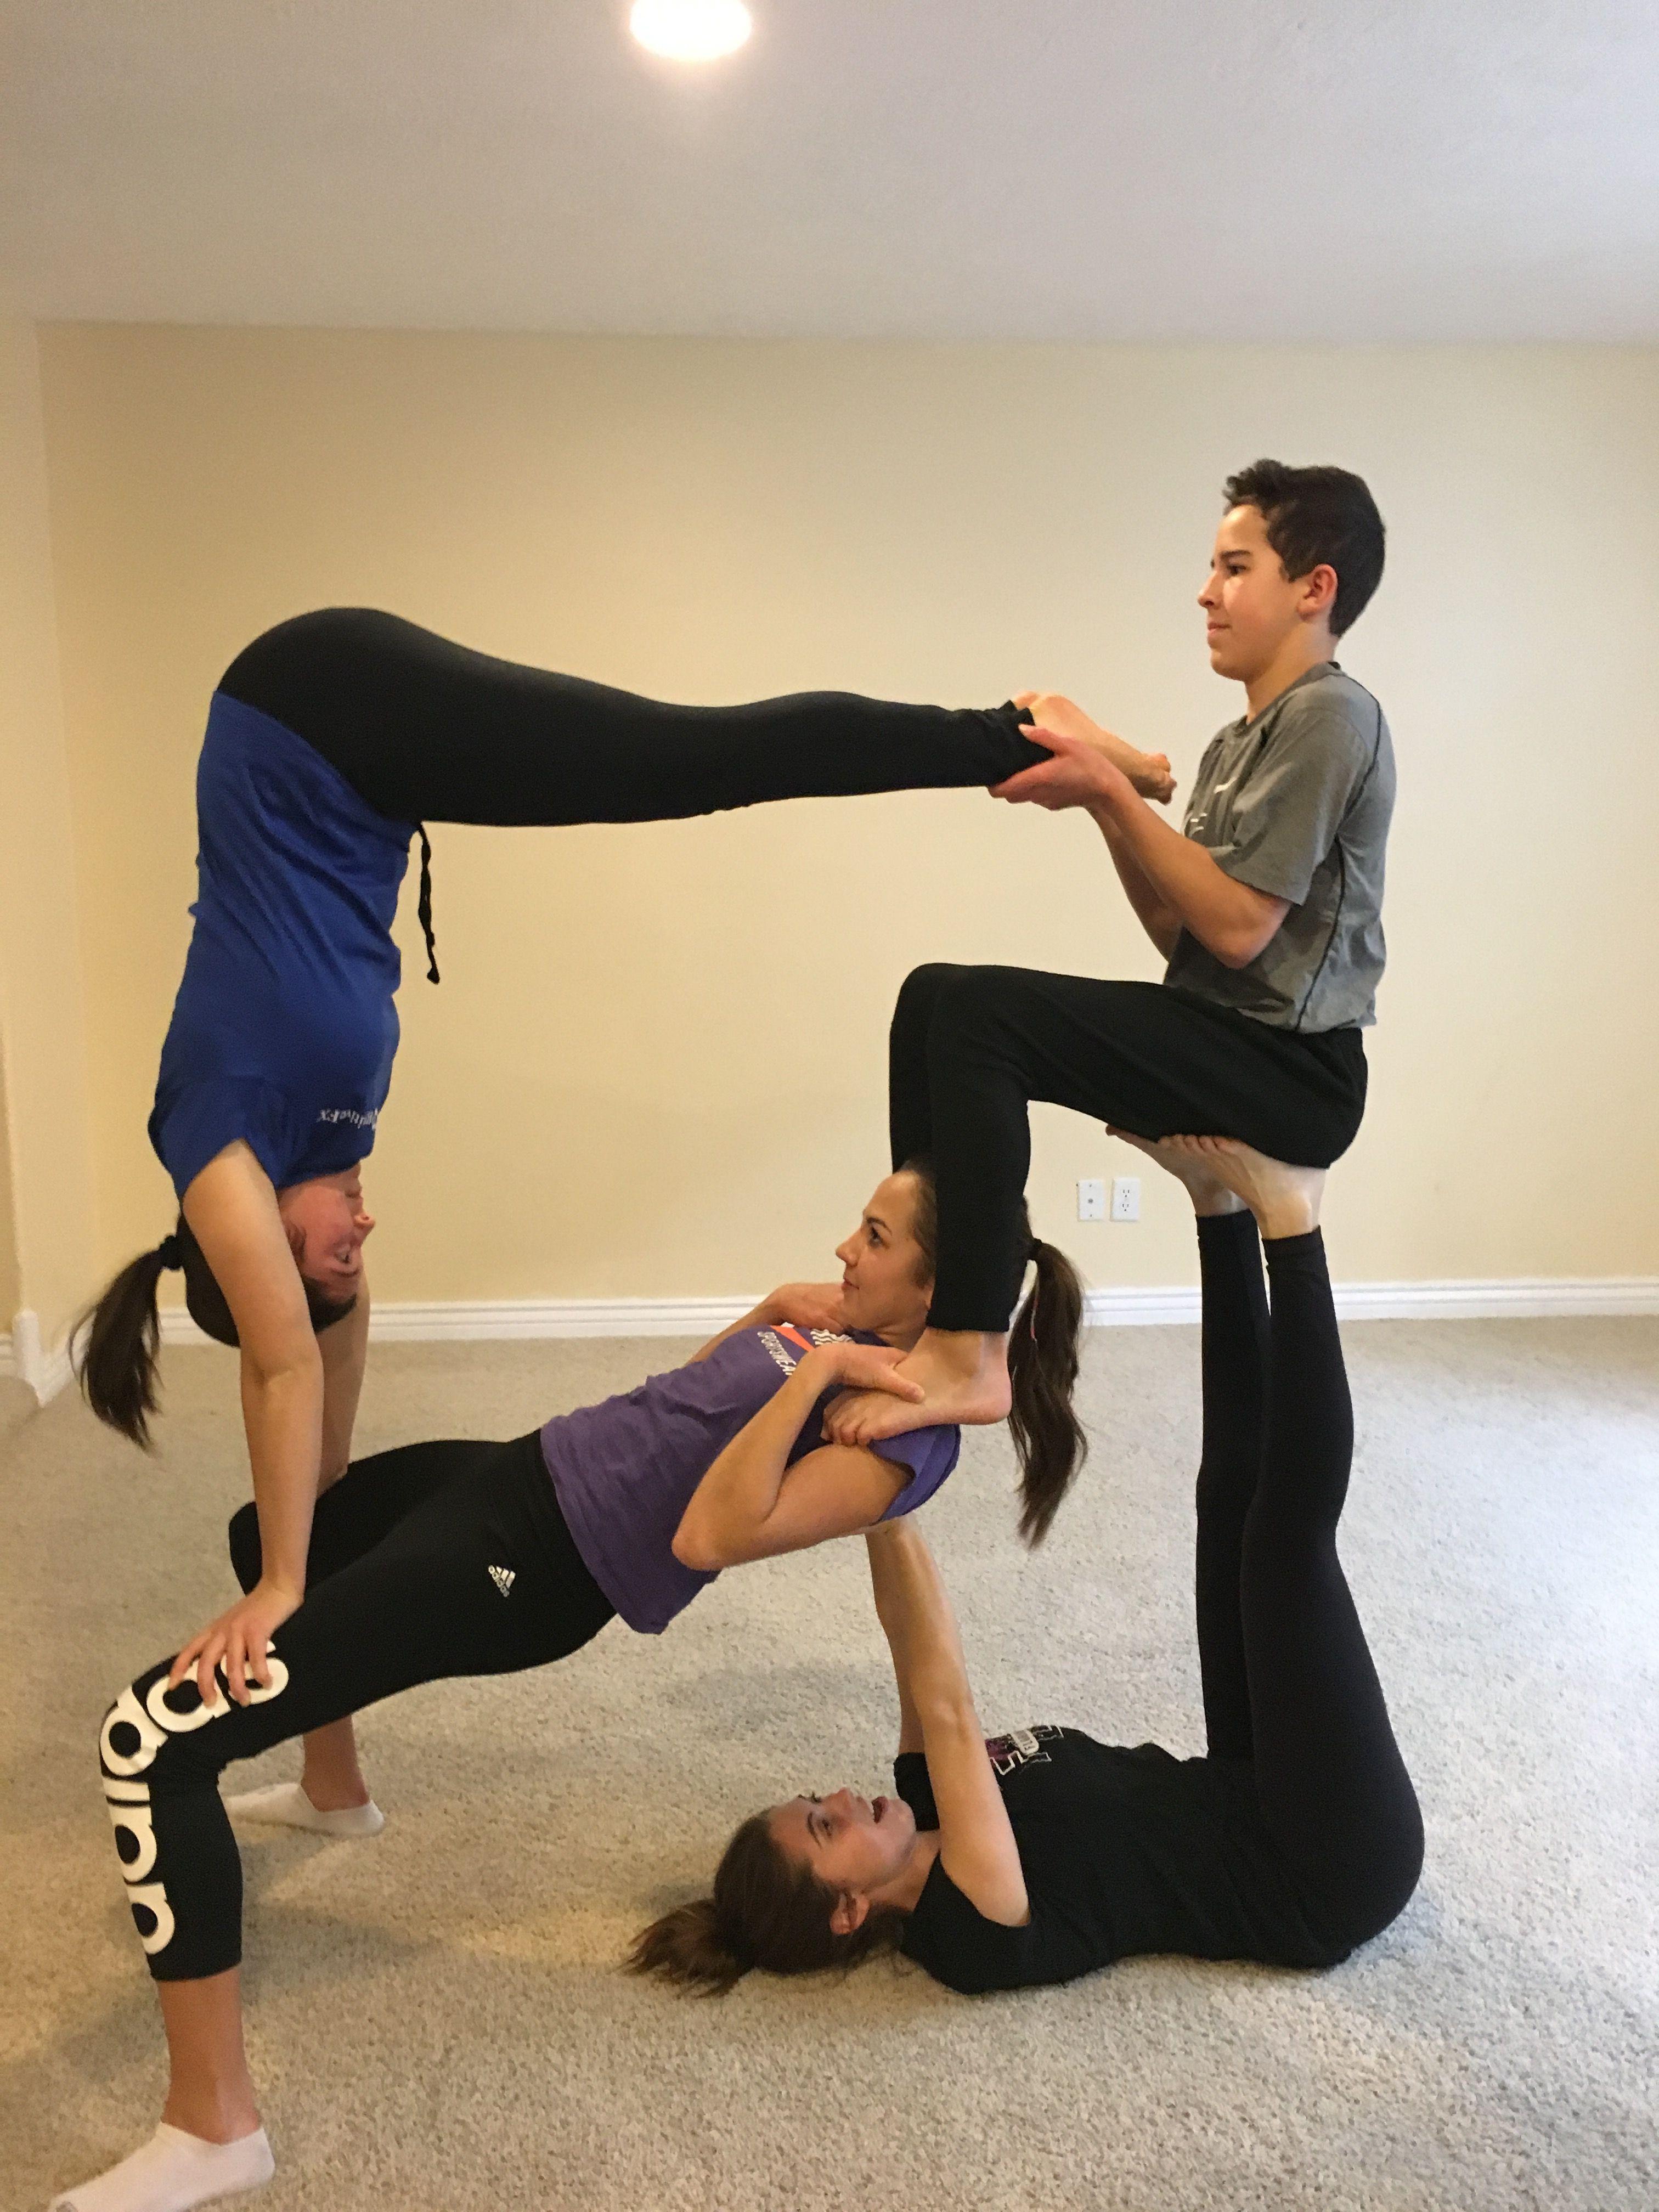 Family Goals Yogagoals Acro Yoga Poses Yoga Poses Partner Yoga